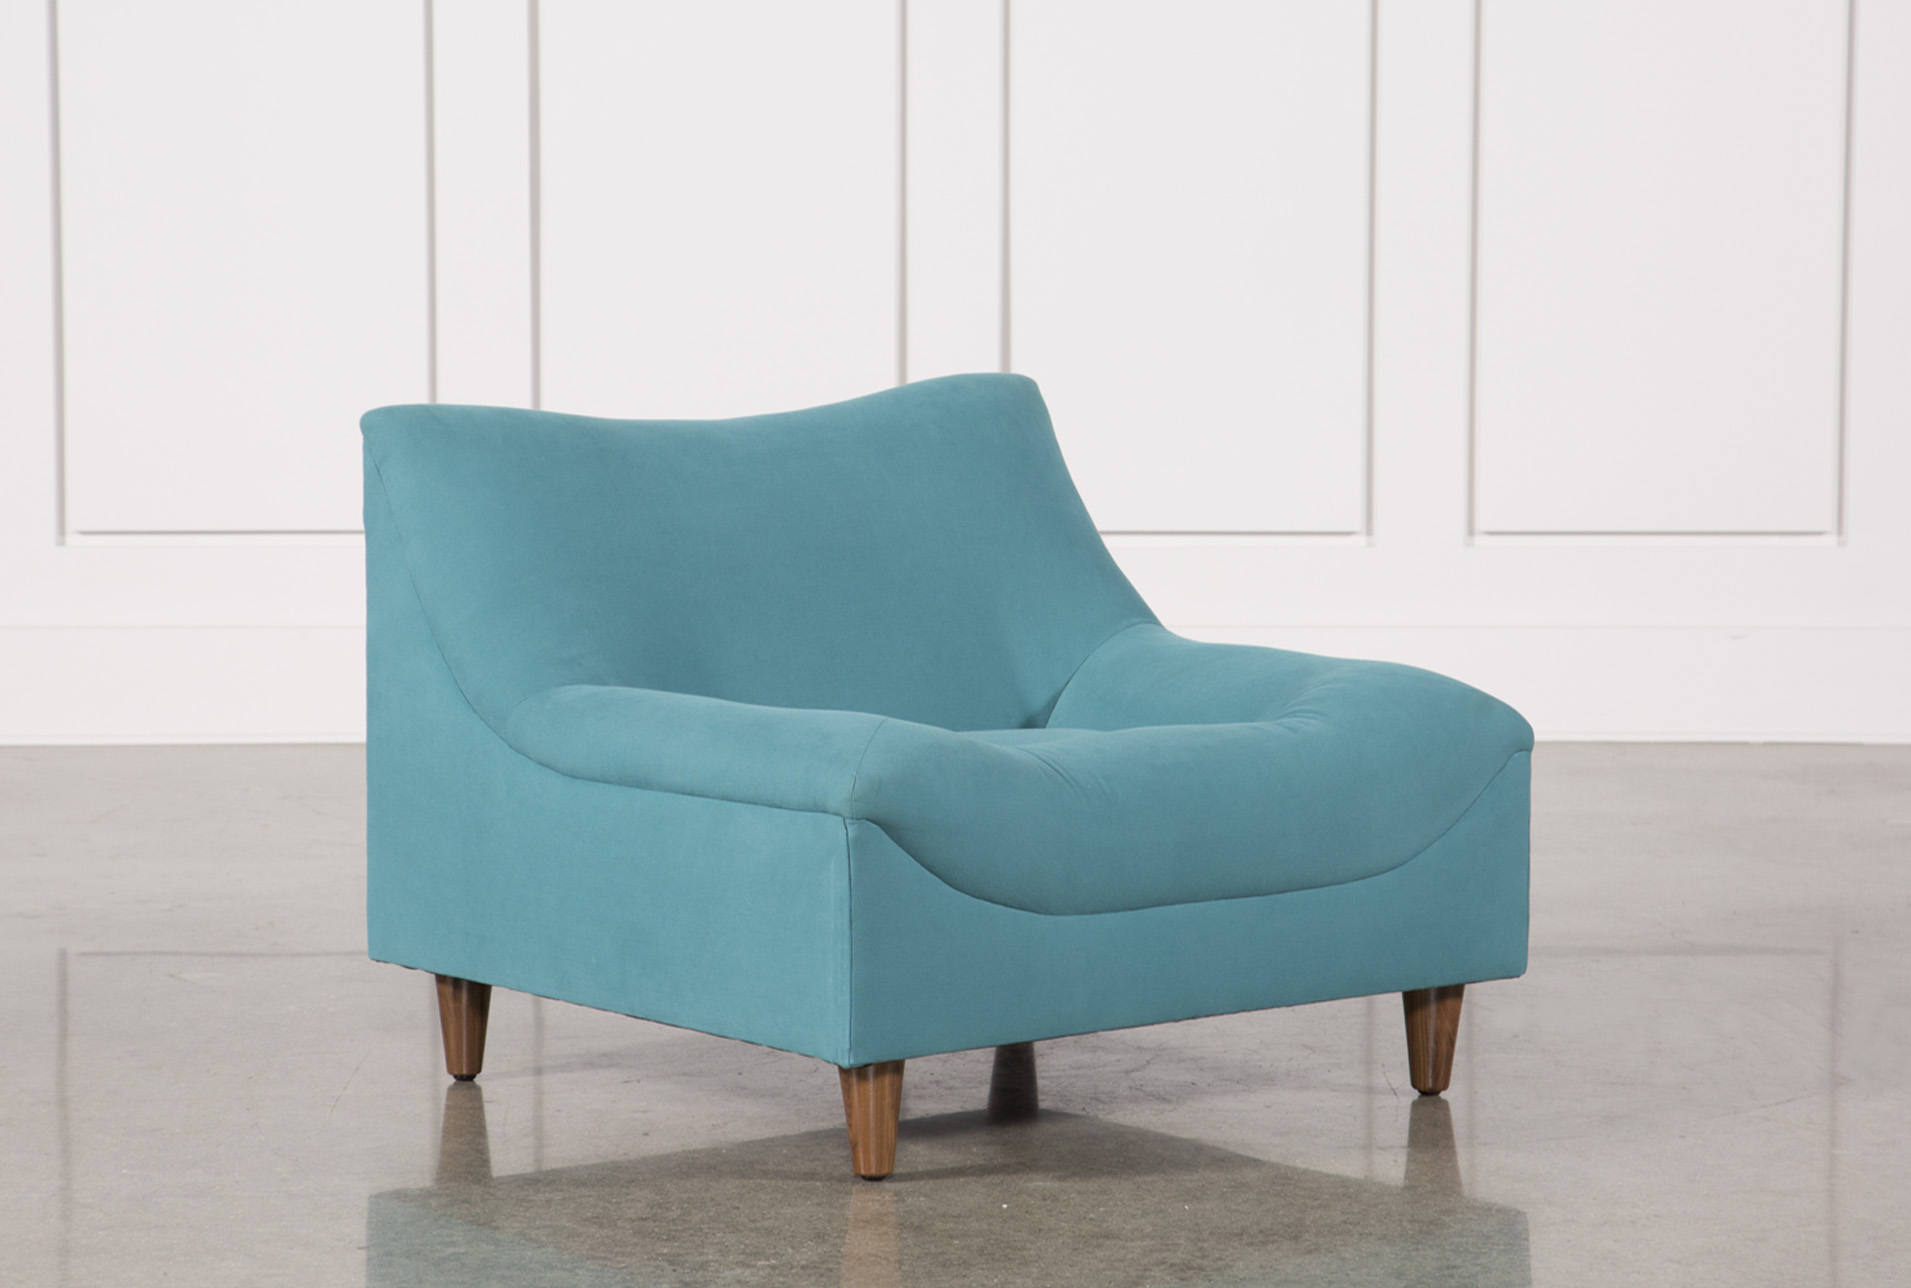 Justina Blakeney Tufo Armless Chair   360